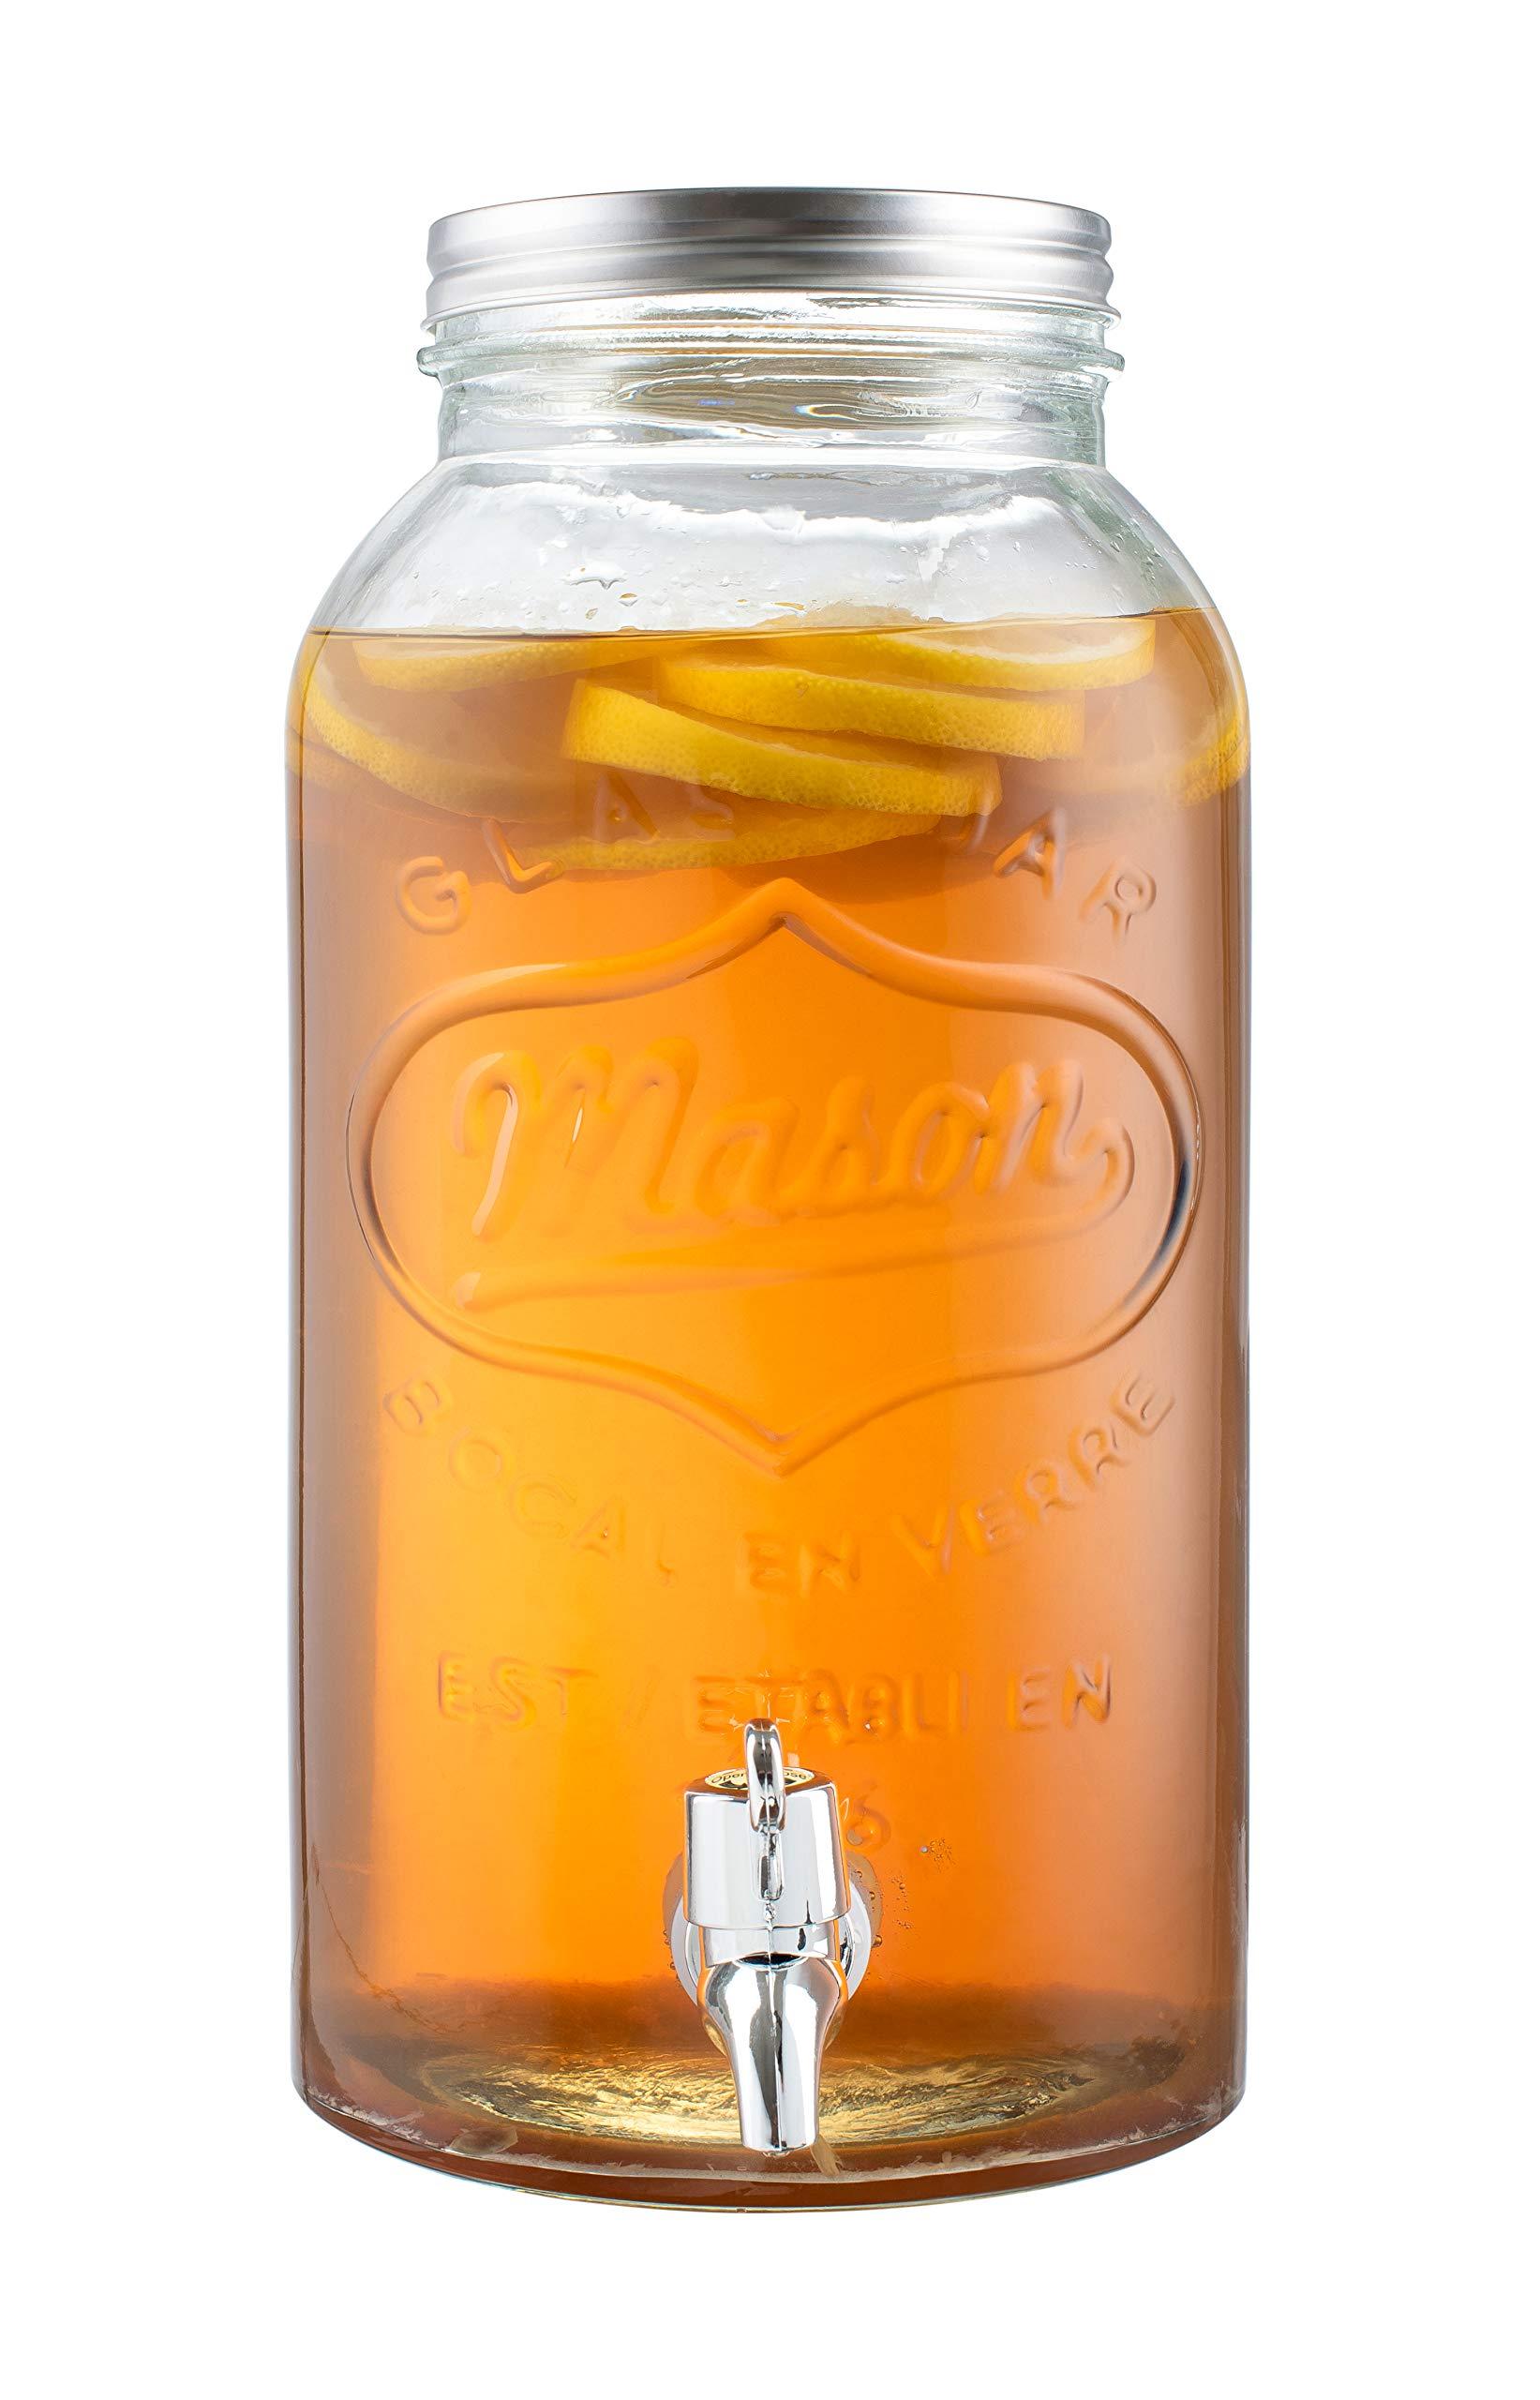 Royalty Art Mason Jar Drink Dispenser with Spigot (1 Gallon) Tea, Juice, and Beverage Server Thick Borosilicate Glass, Screw On Lid Leak Resistant and Dishwasher Safe